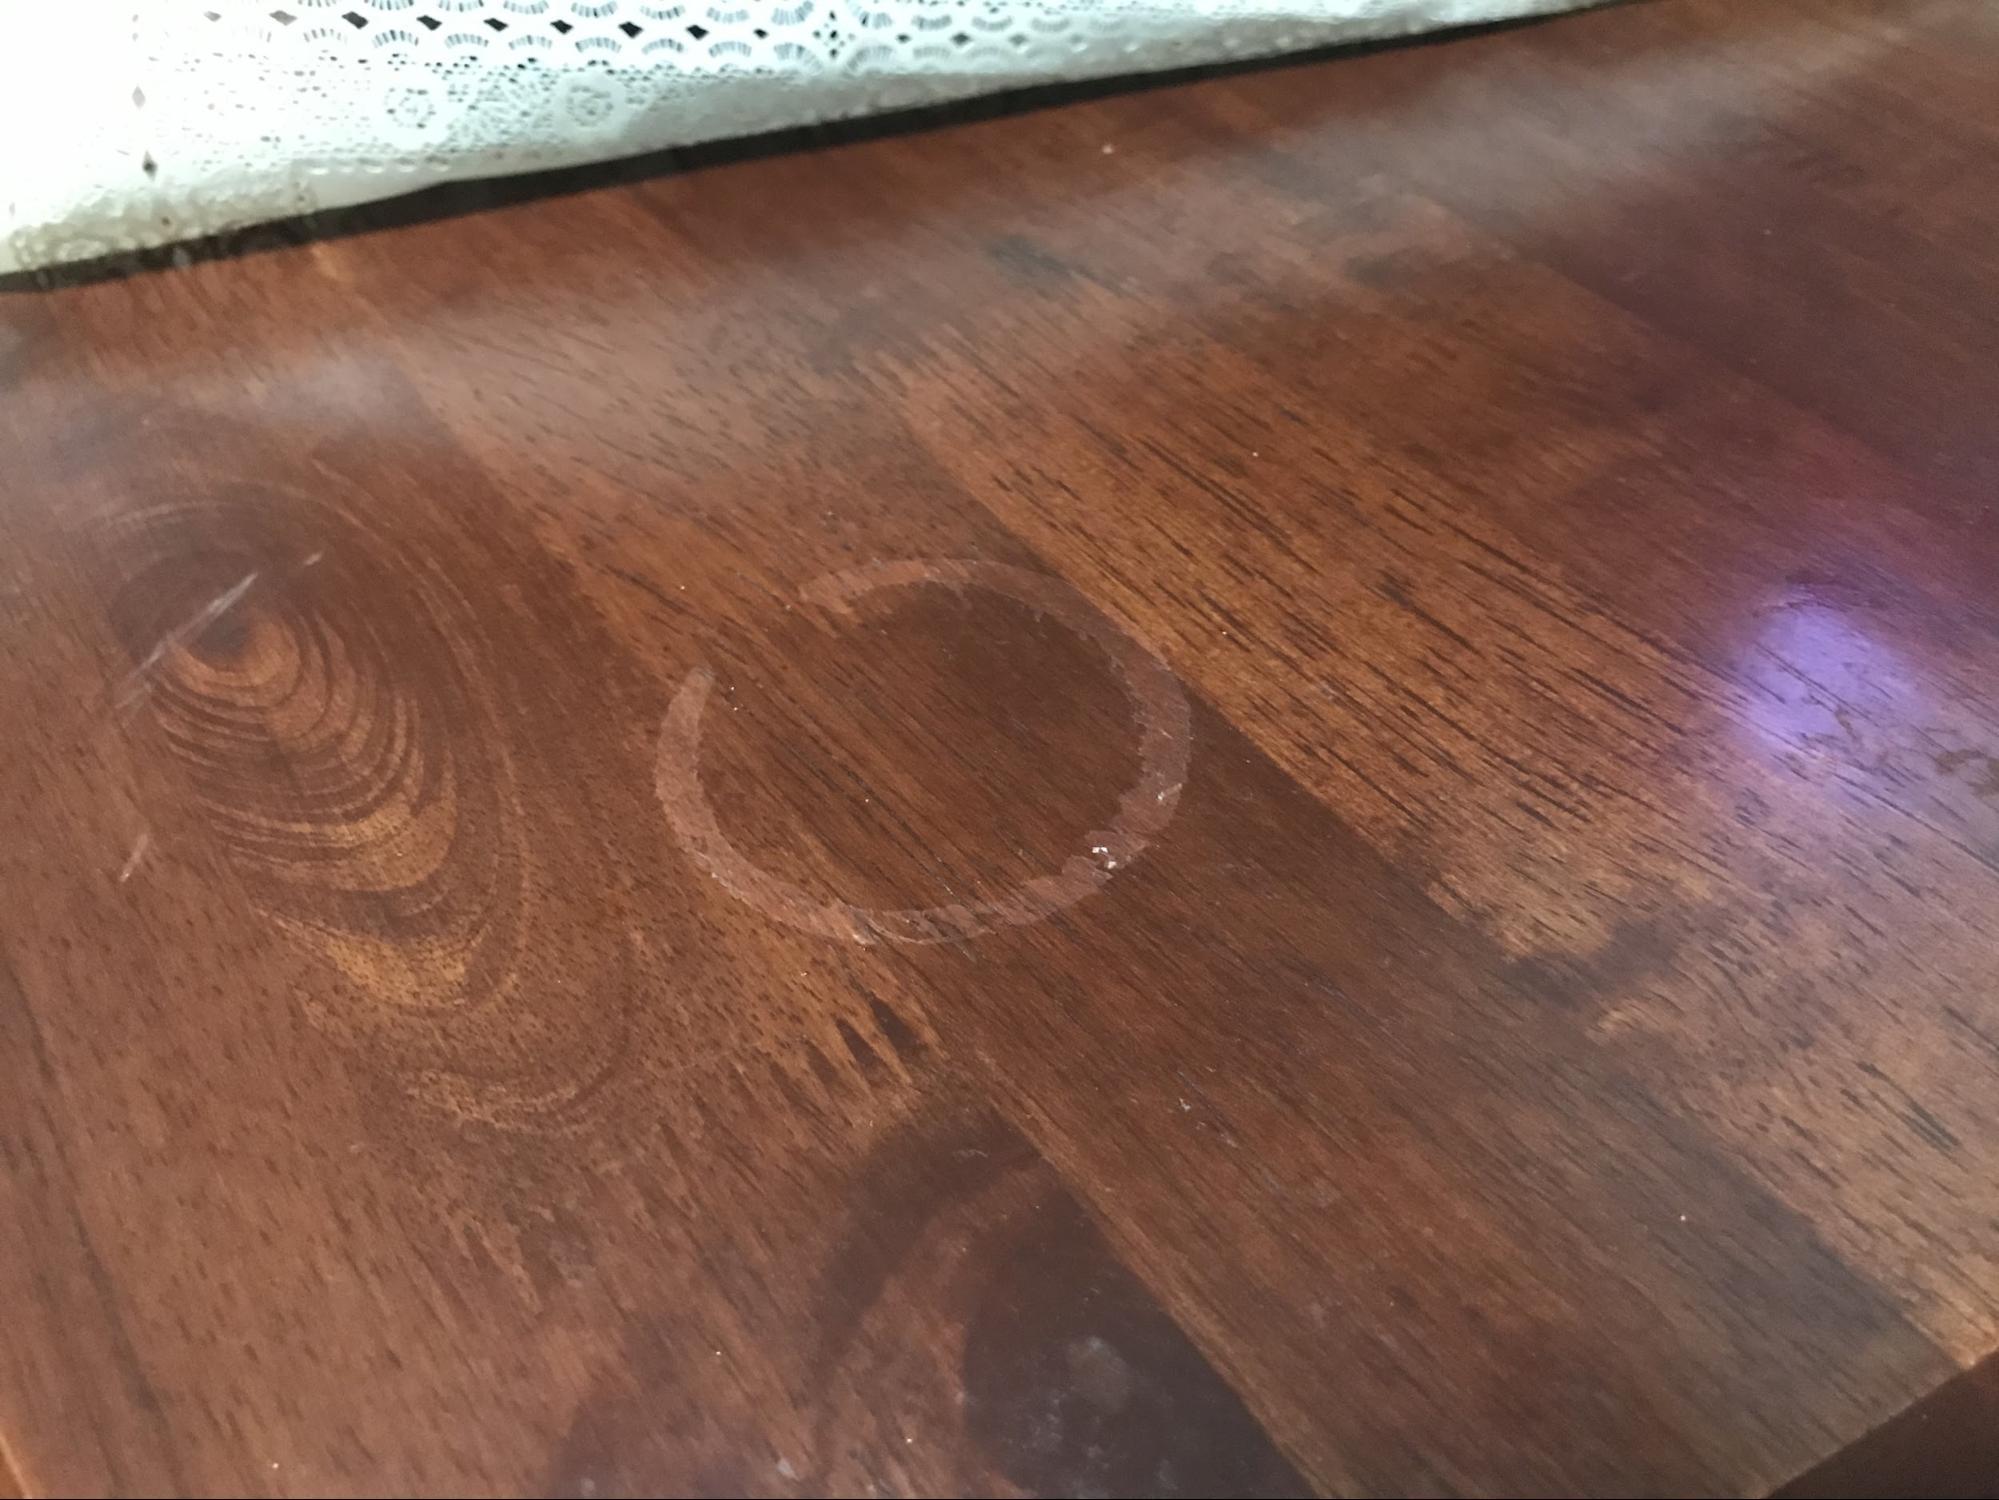 Watermarked wood